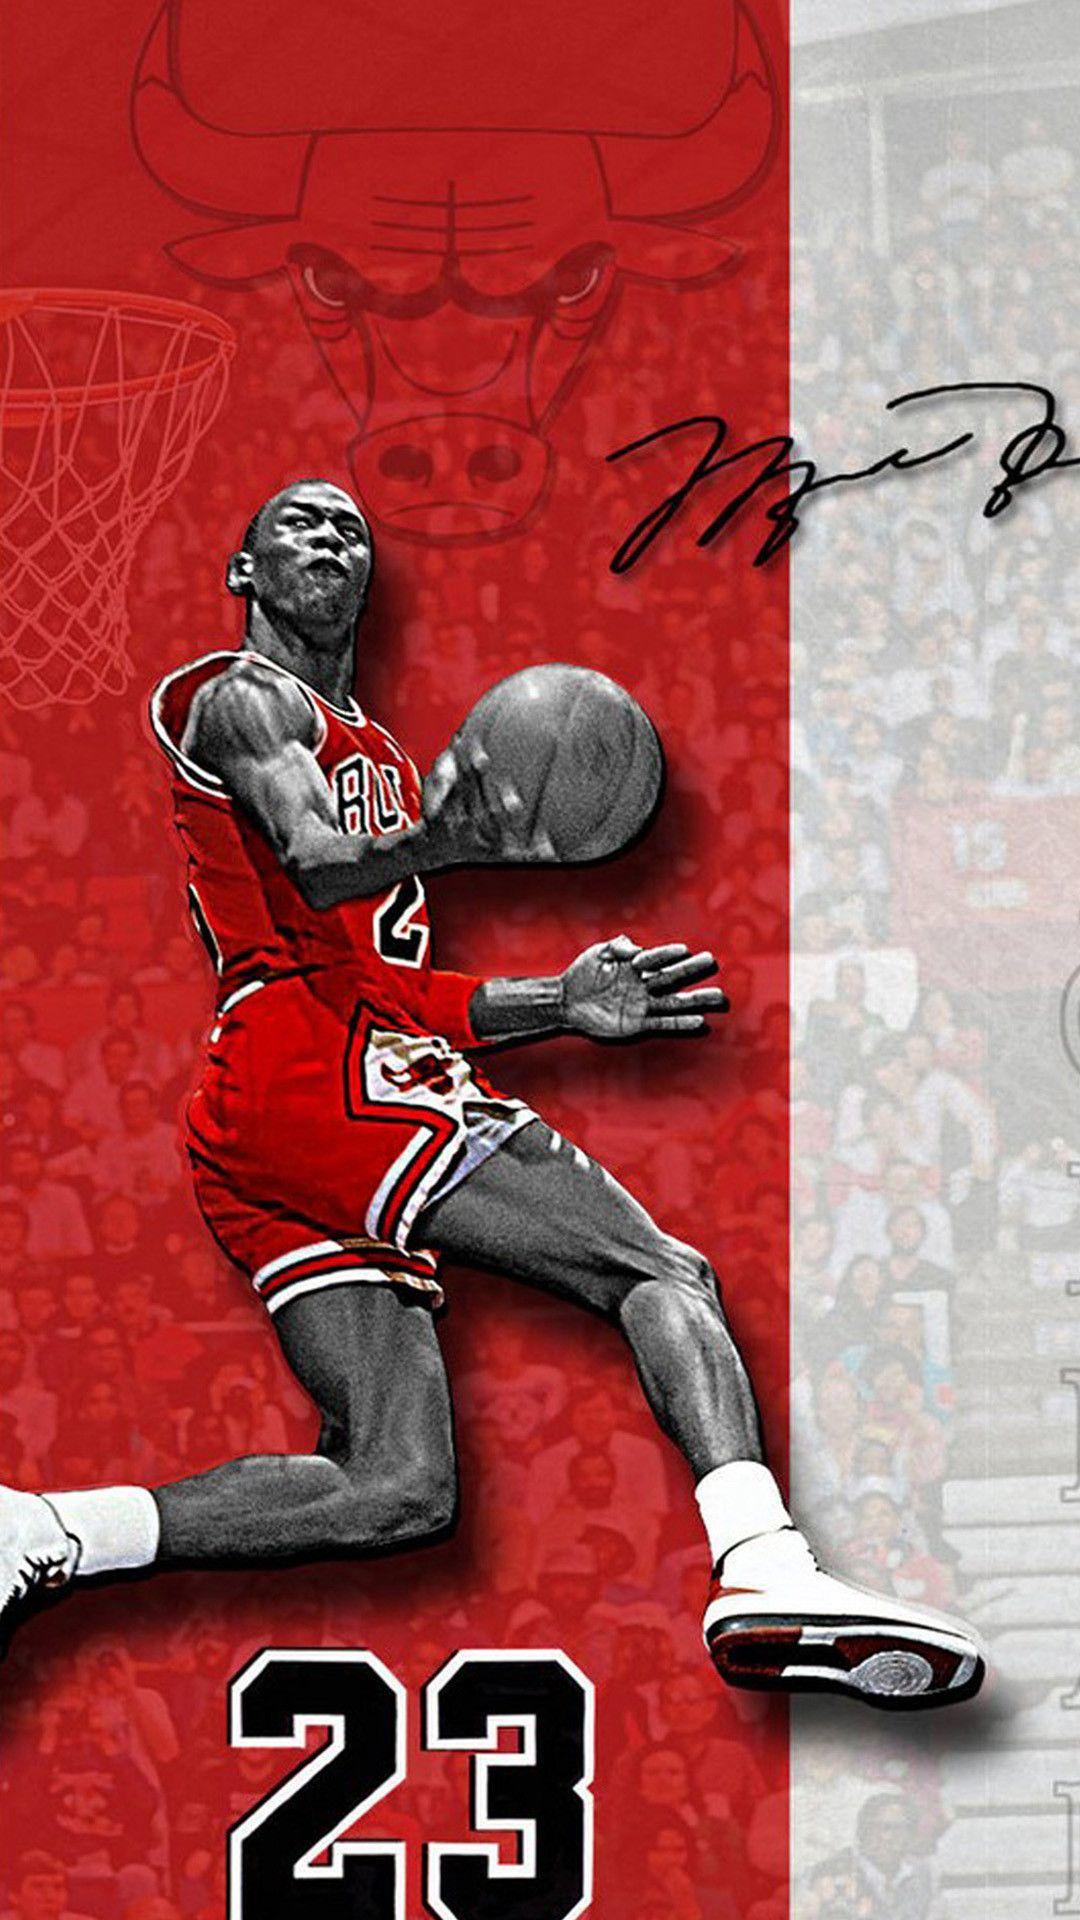 Jordan Background Hd Wallpaper Hupages Download Iphone